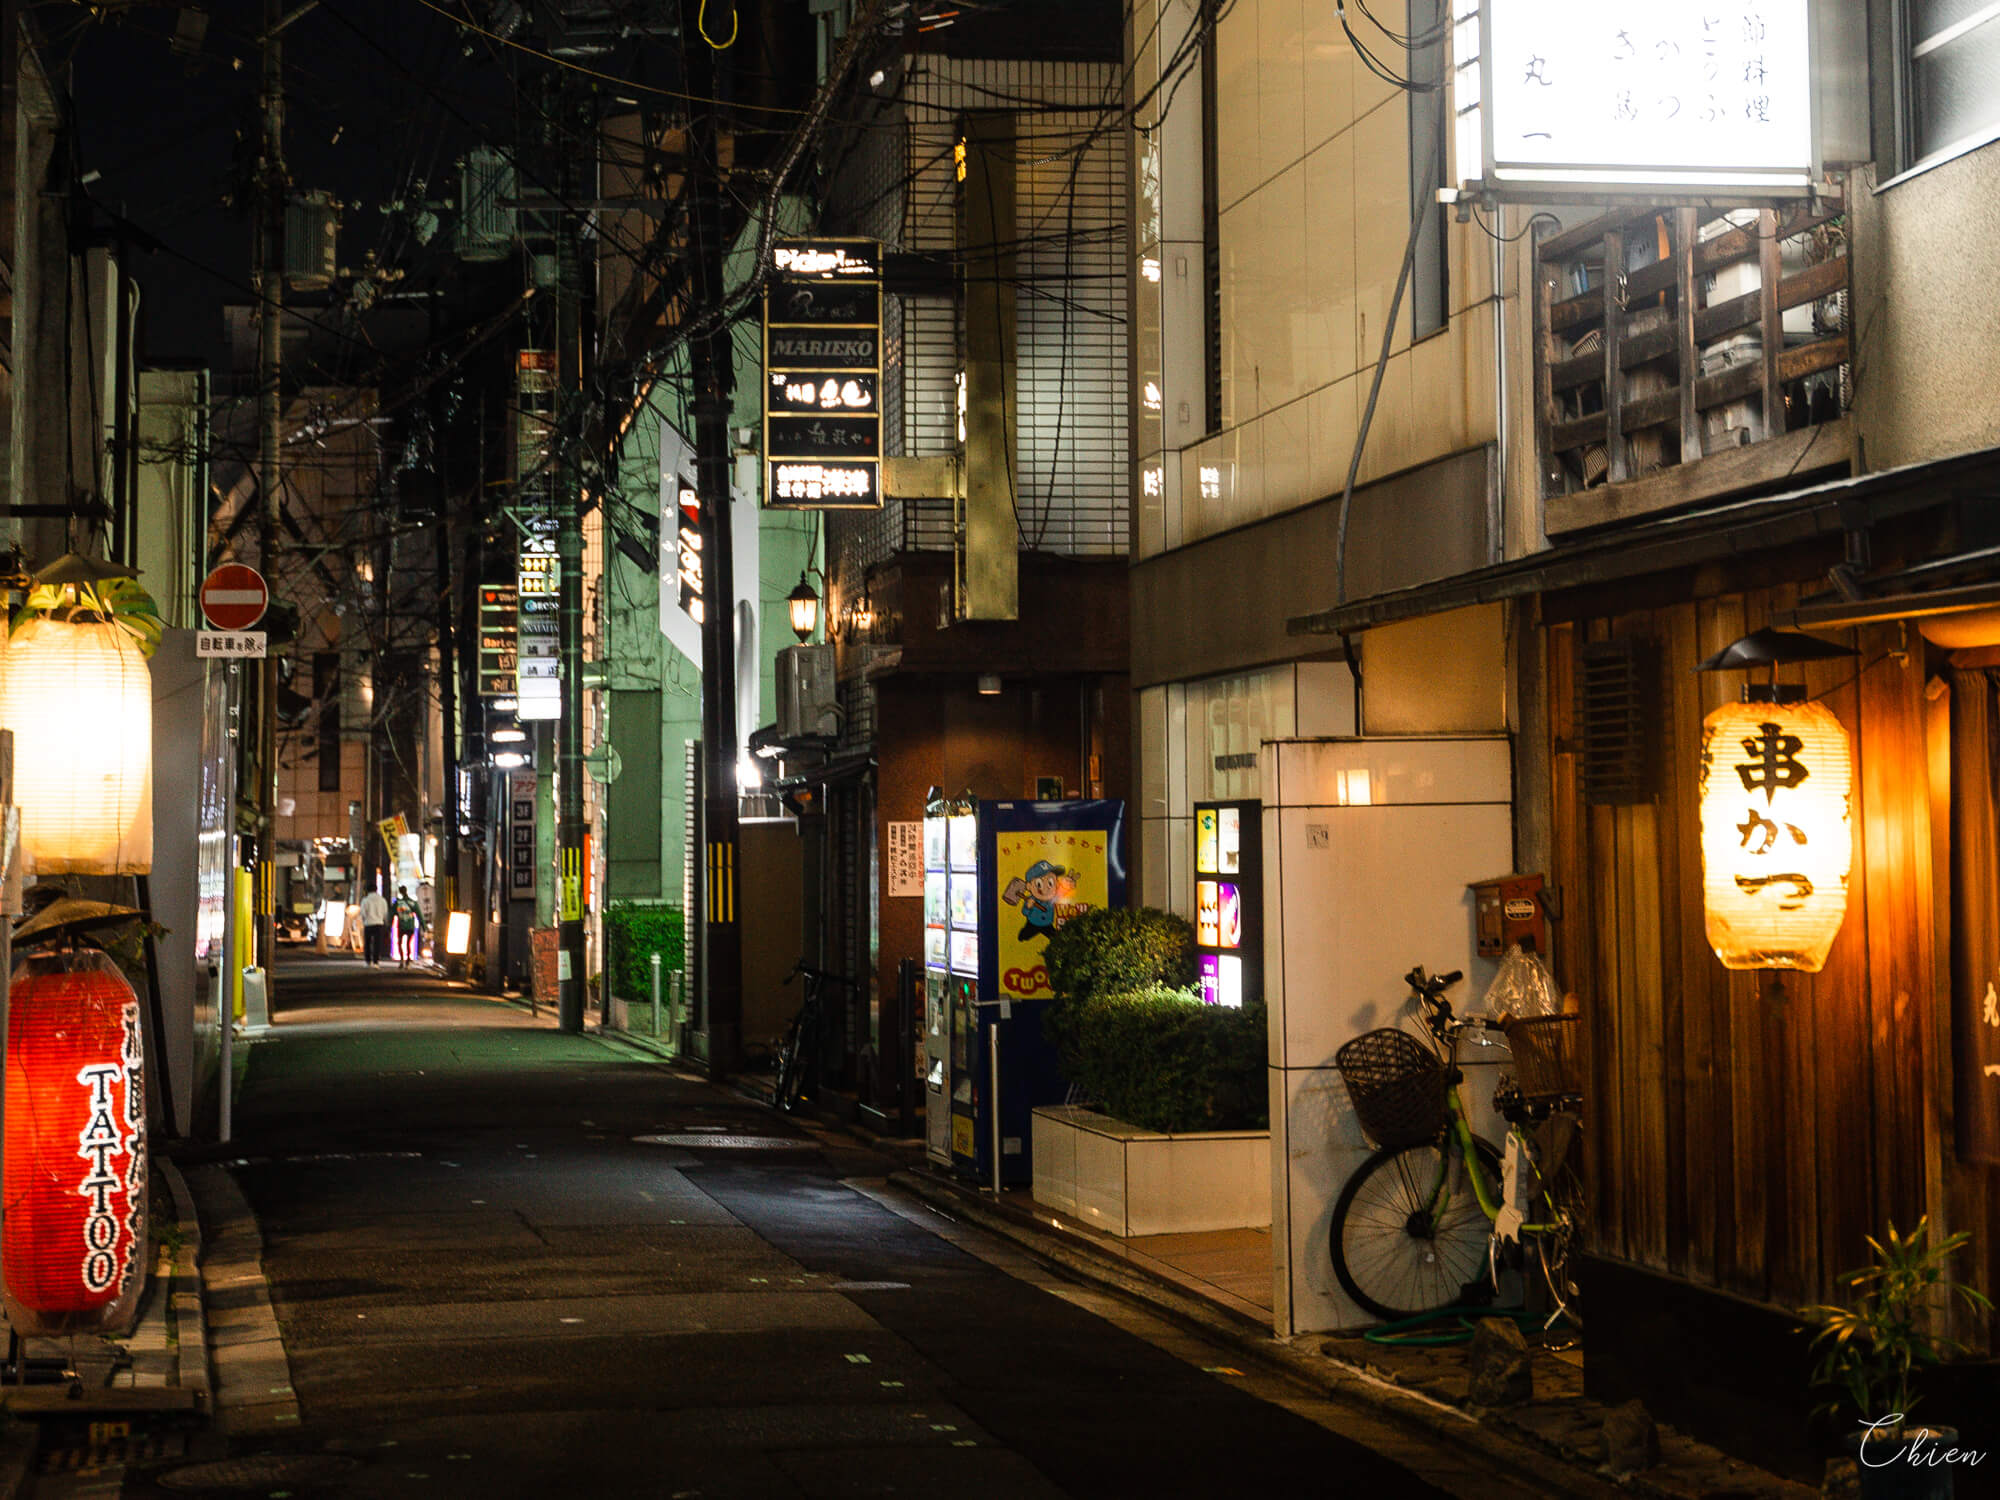 京都祇園鴨肉沾麵美食 Gion Duck Noodles🦆🍜